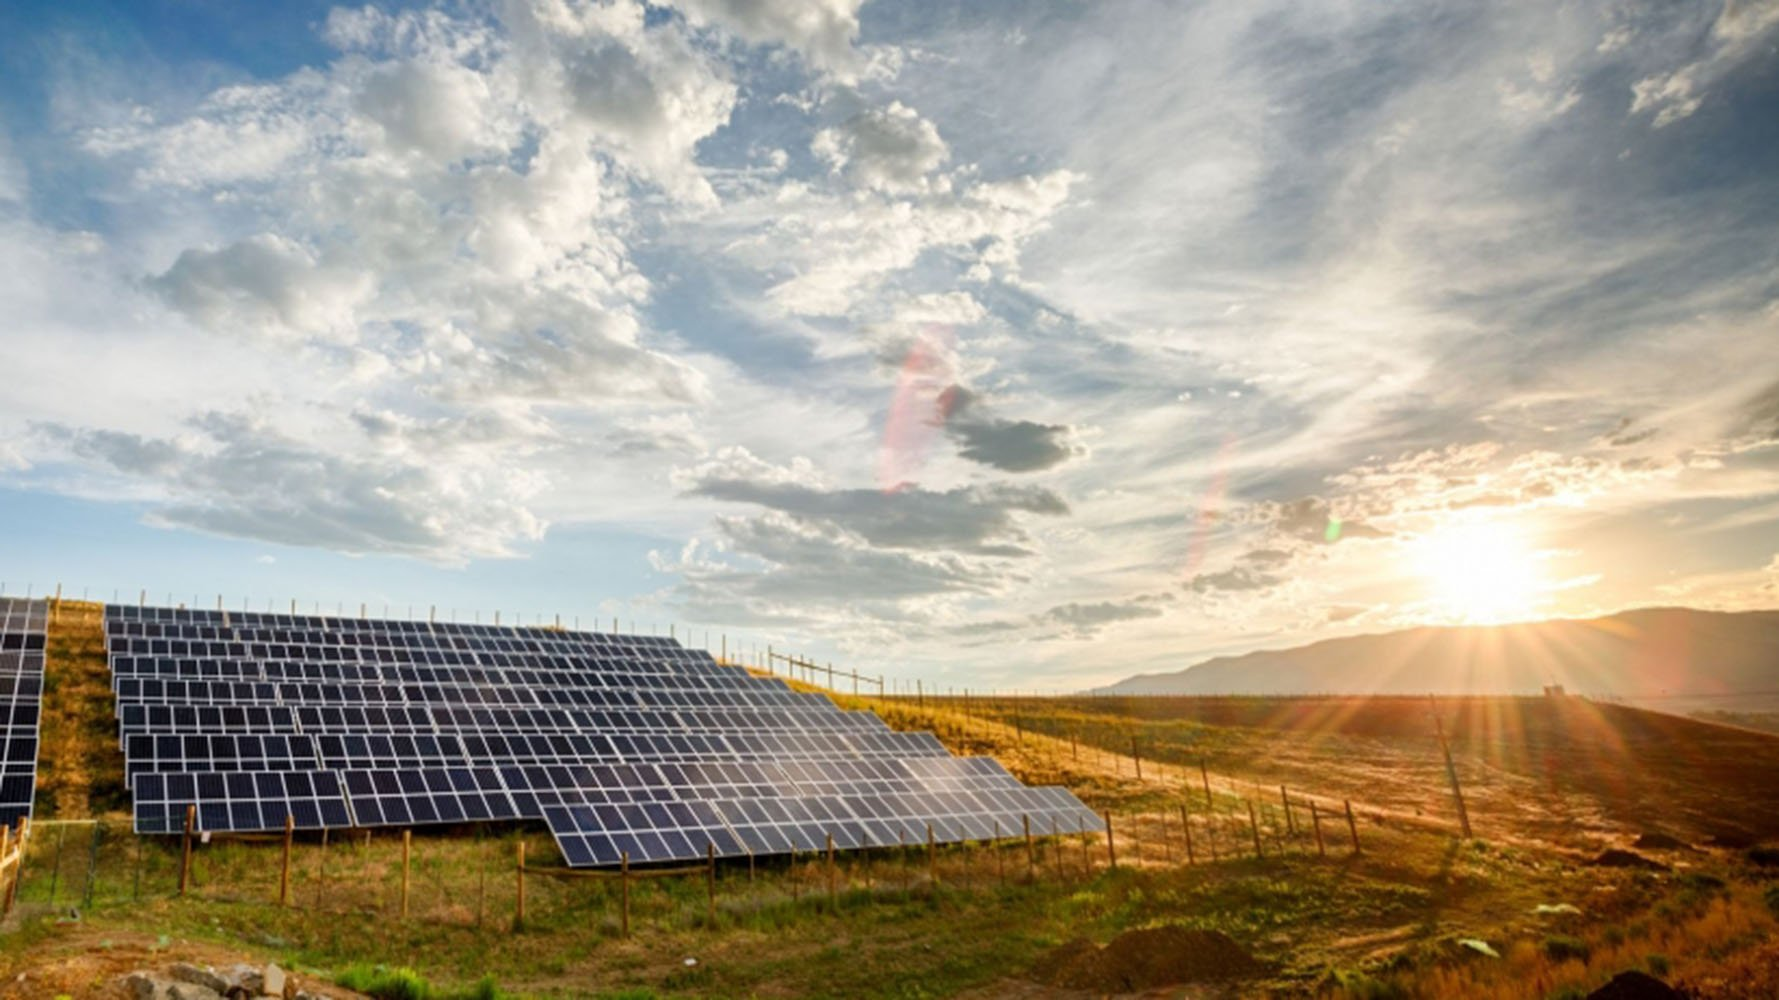 ECO-WORTHY 100 Watt Solar Panel 12 Volts Monocrystalline Solar Panel High Efficiency Mono Module RV Marine Boat Off Grid by ECO-WORTHY (Image #7)